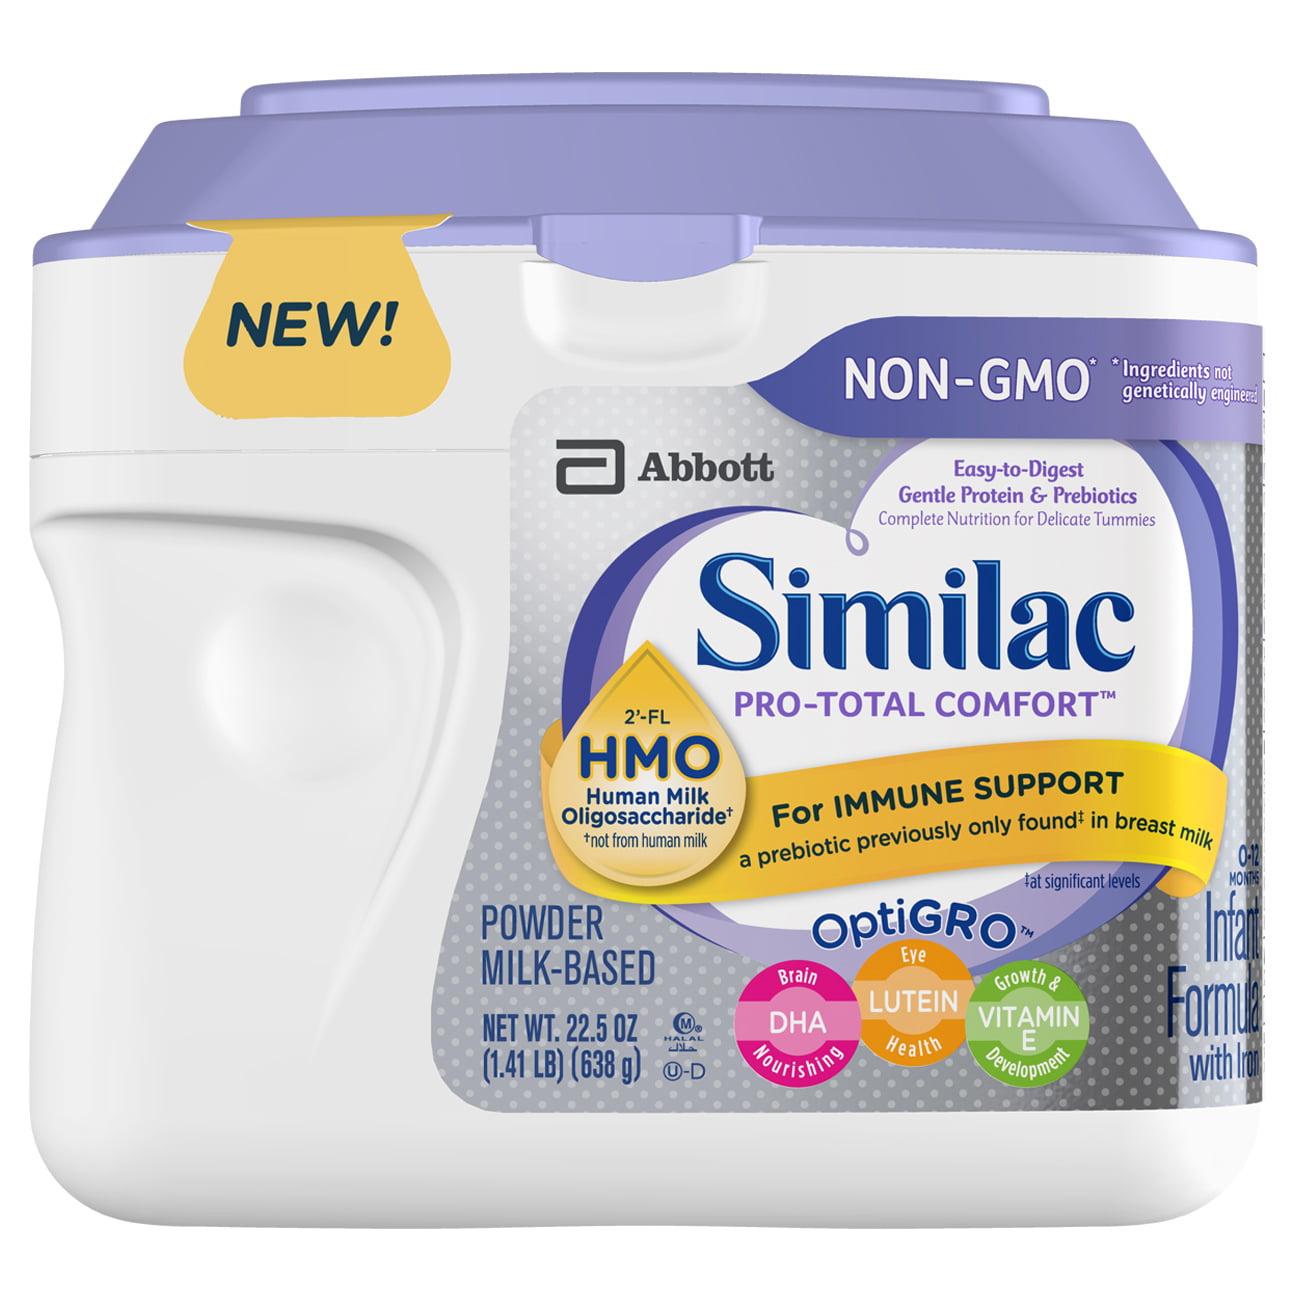 Similac Pro-Total Comfort Non-GMO Infant Formula Powder, 22.5 oz Tub, 4 Count by Similac